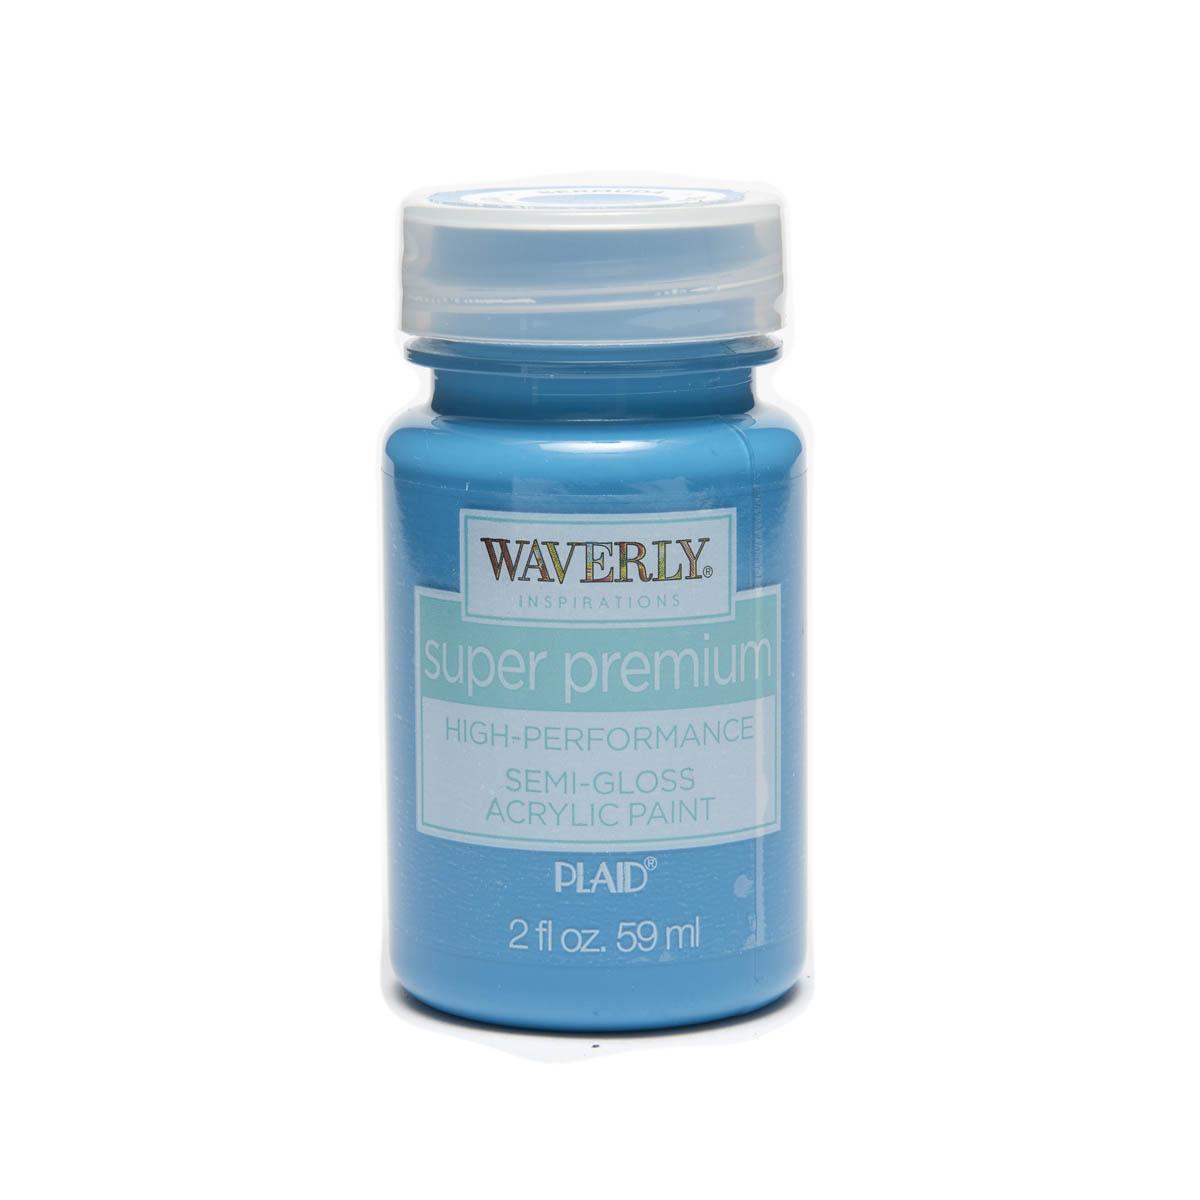 Waverly ® Inspirations Super Premium Semi-Gloss Acrylic Paint - Bermuda, 2 oz.